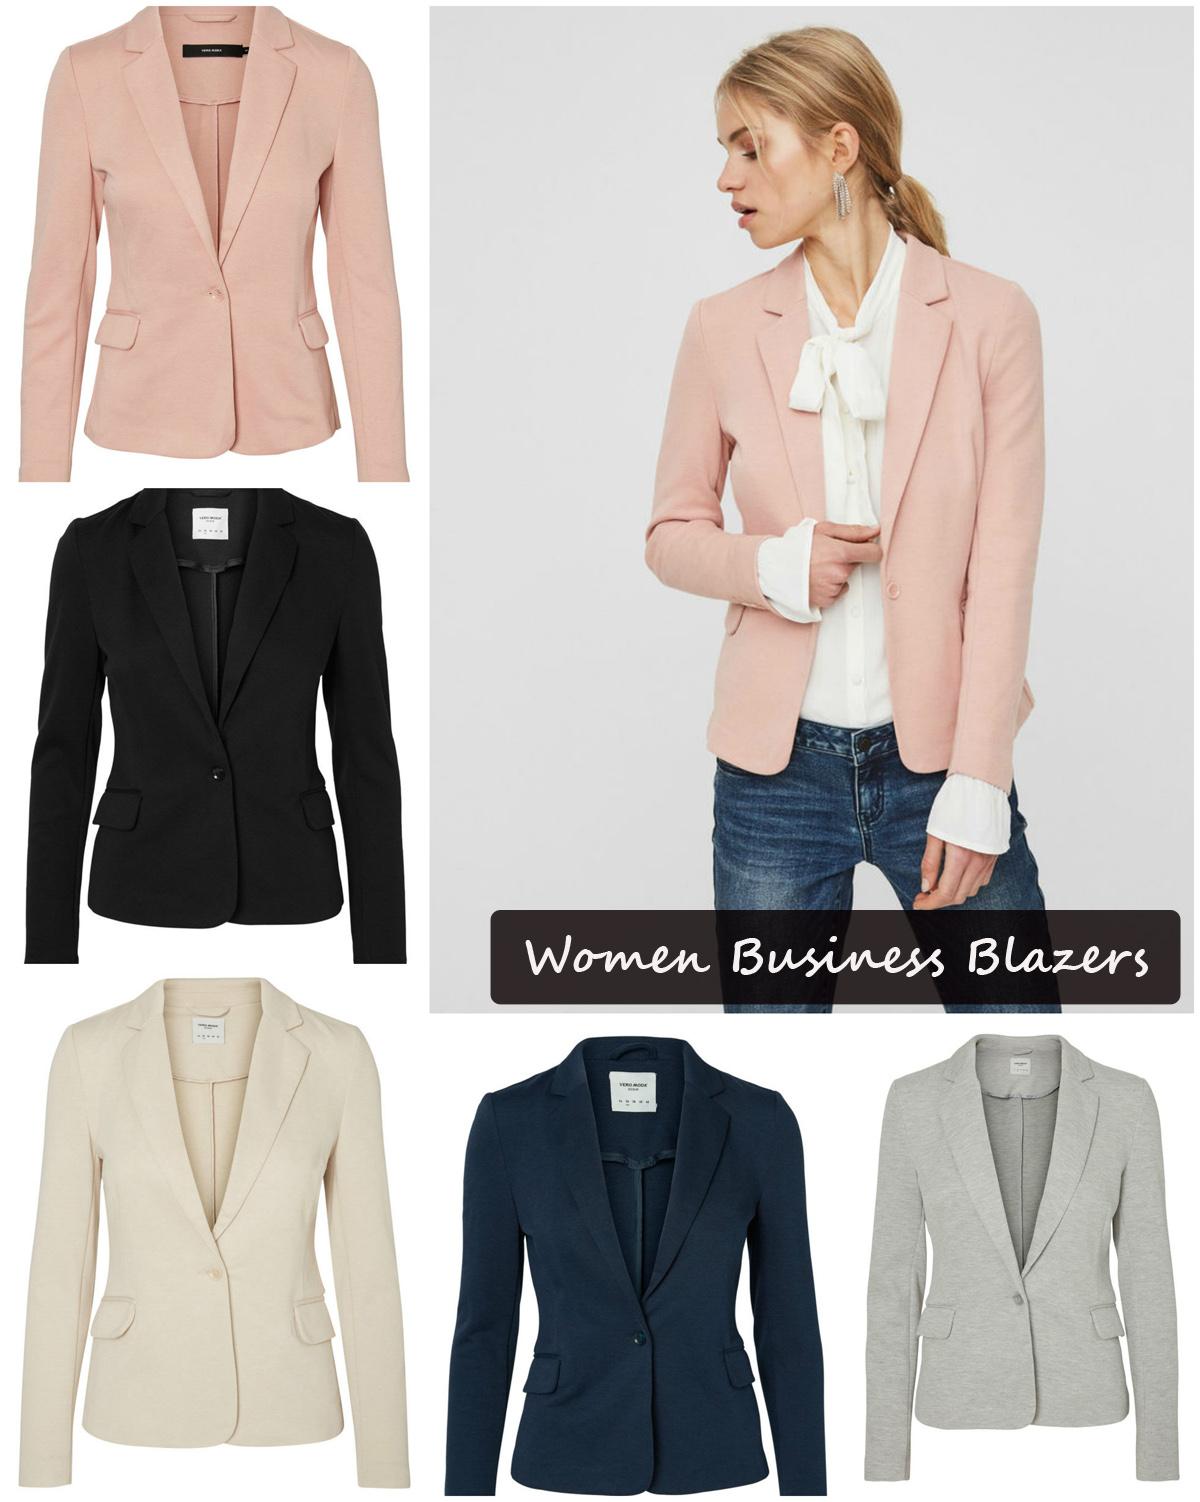 women-business-blazers